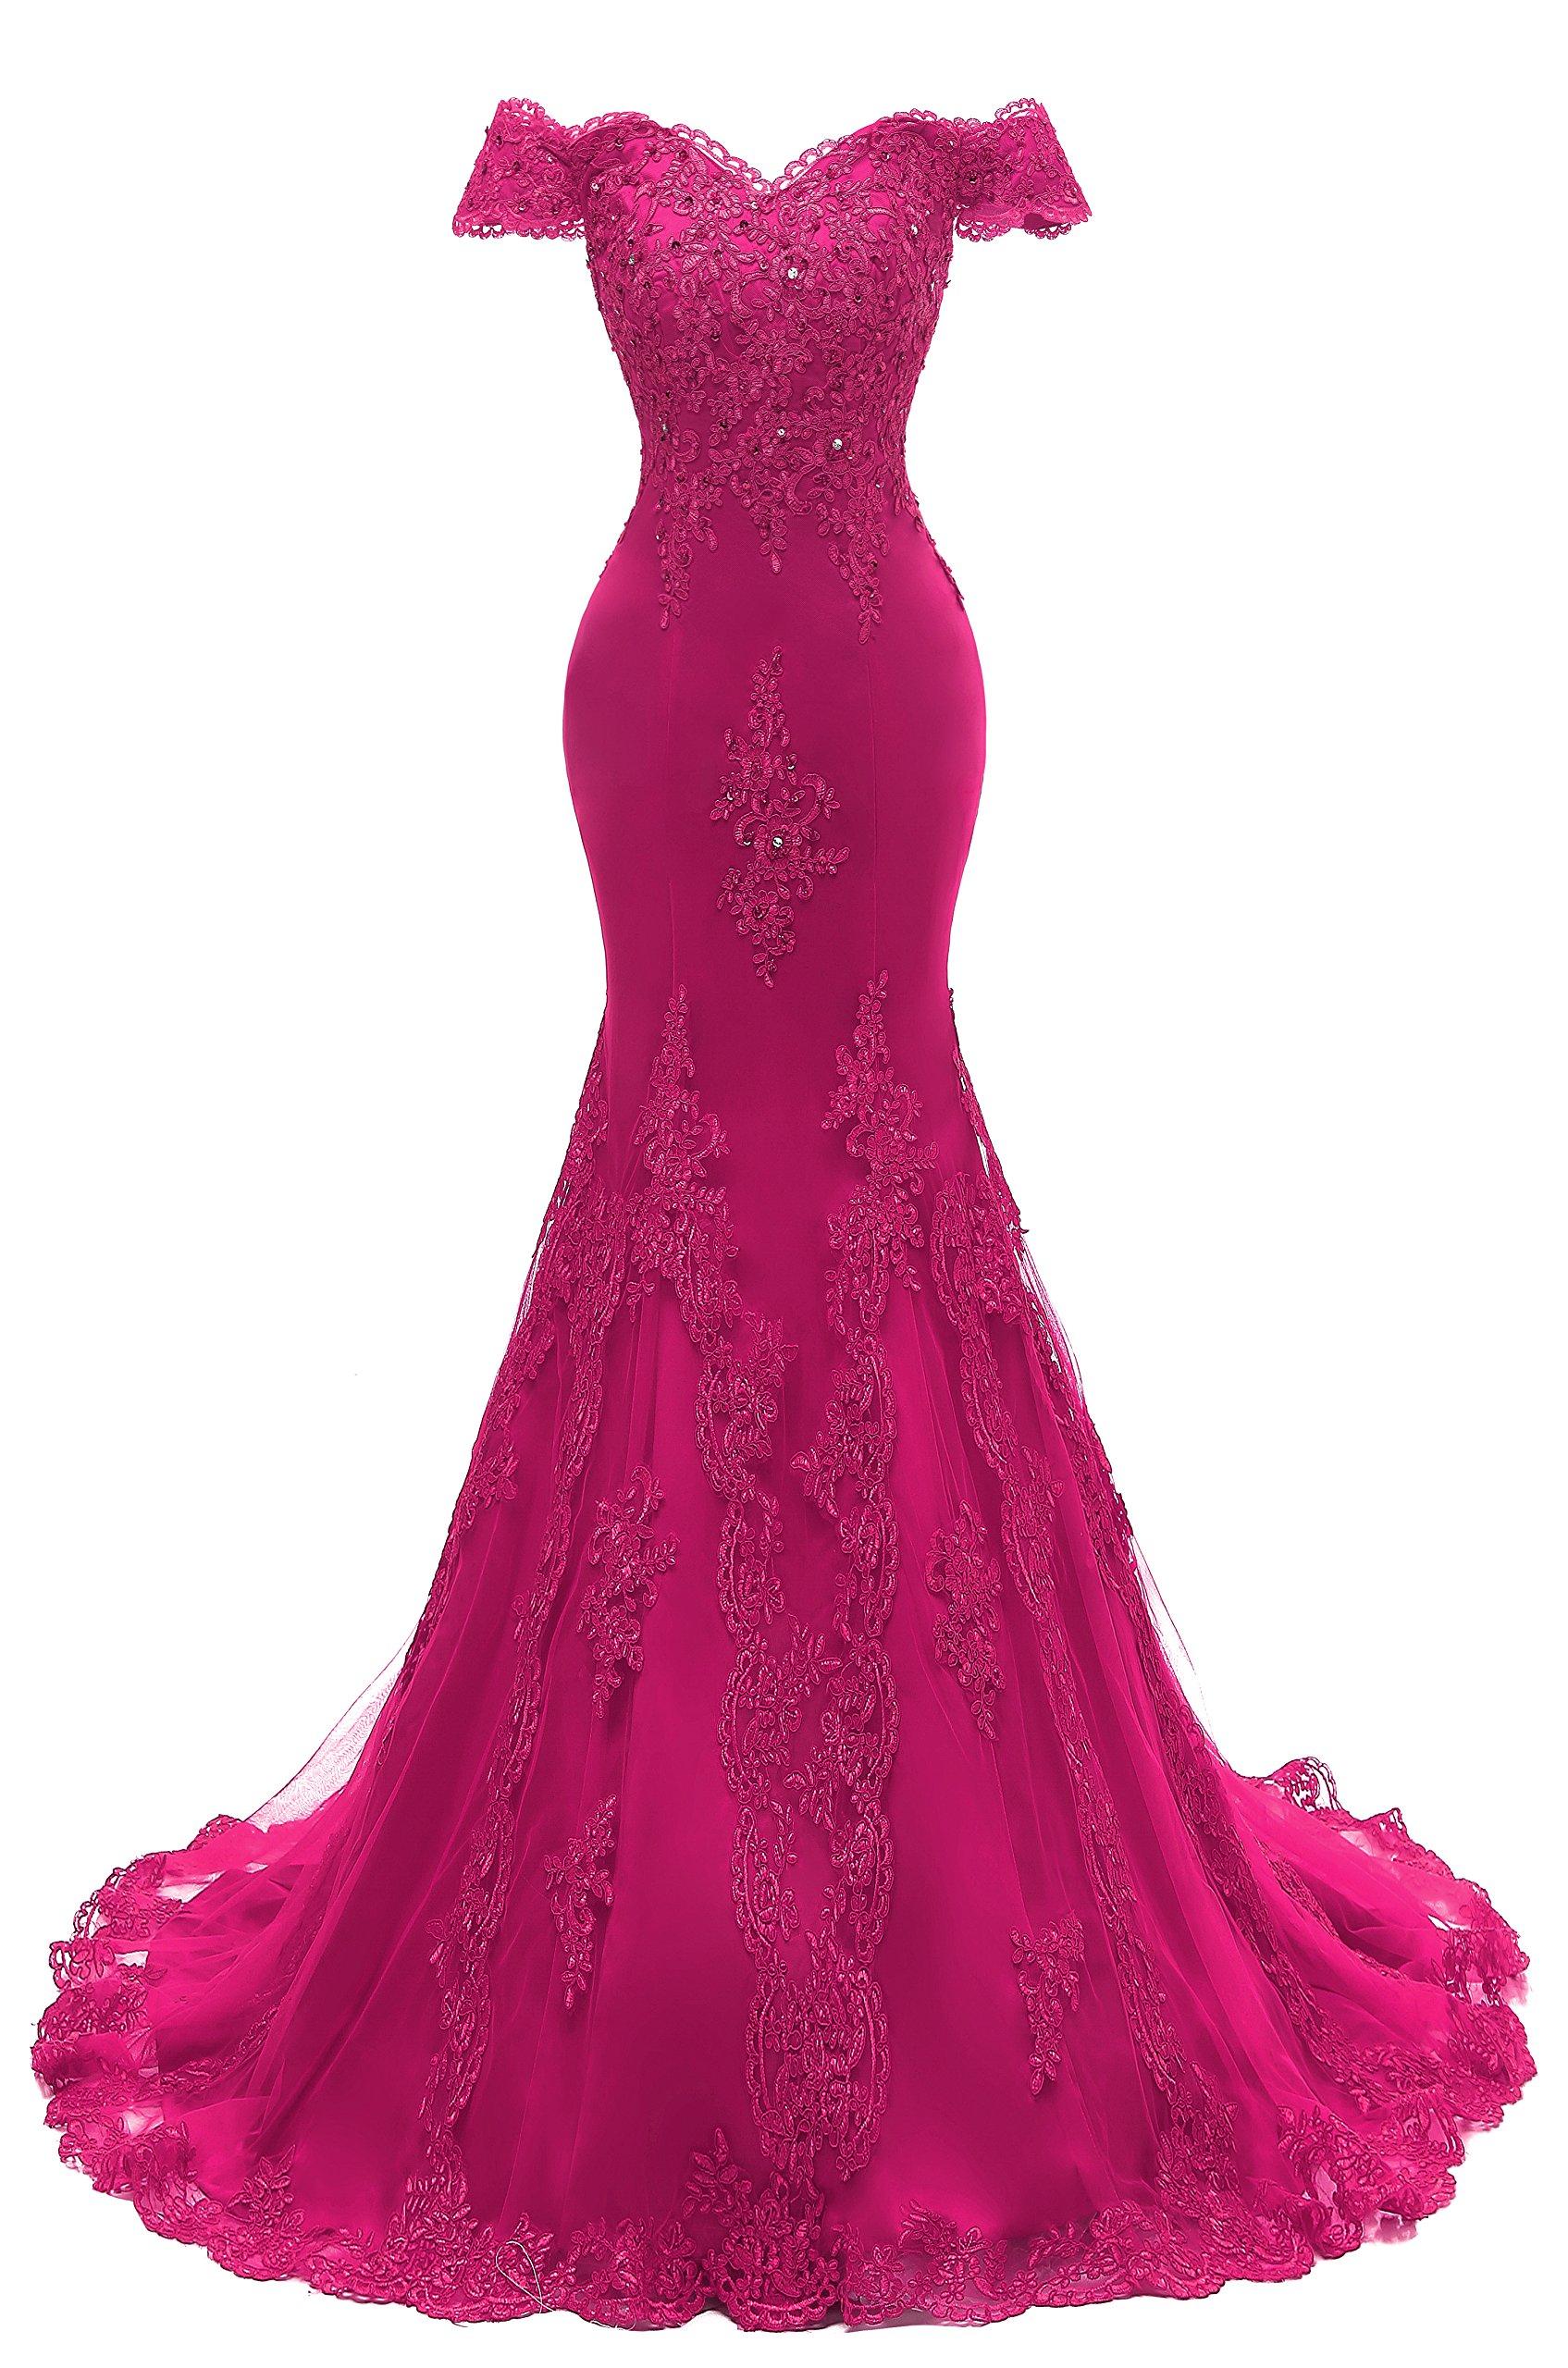 Himoda Women's V Neckline Beaded Evening Gowns Mermaid Lace Prom Dresses Long H074 16 Fuchsia